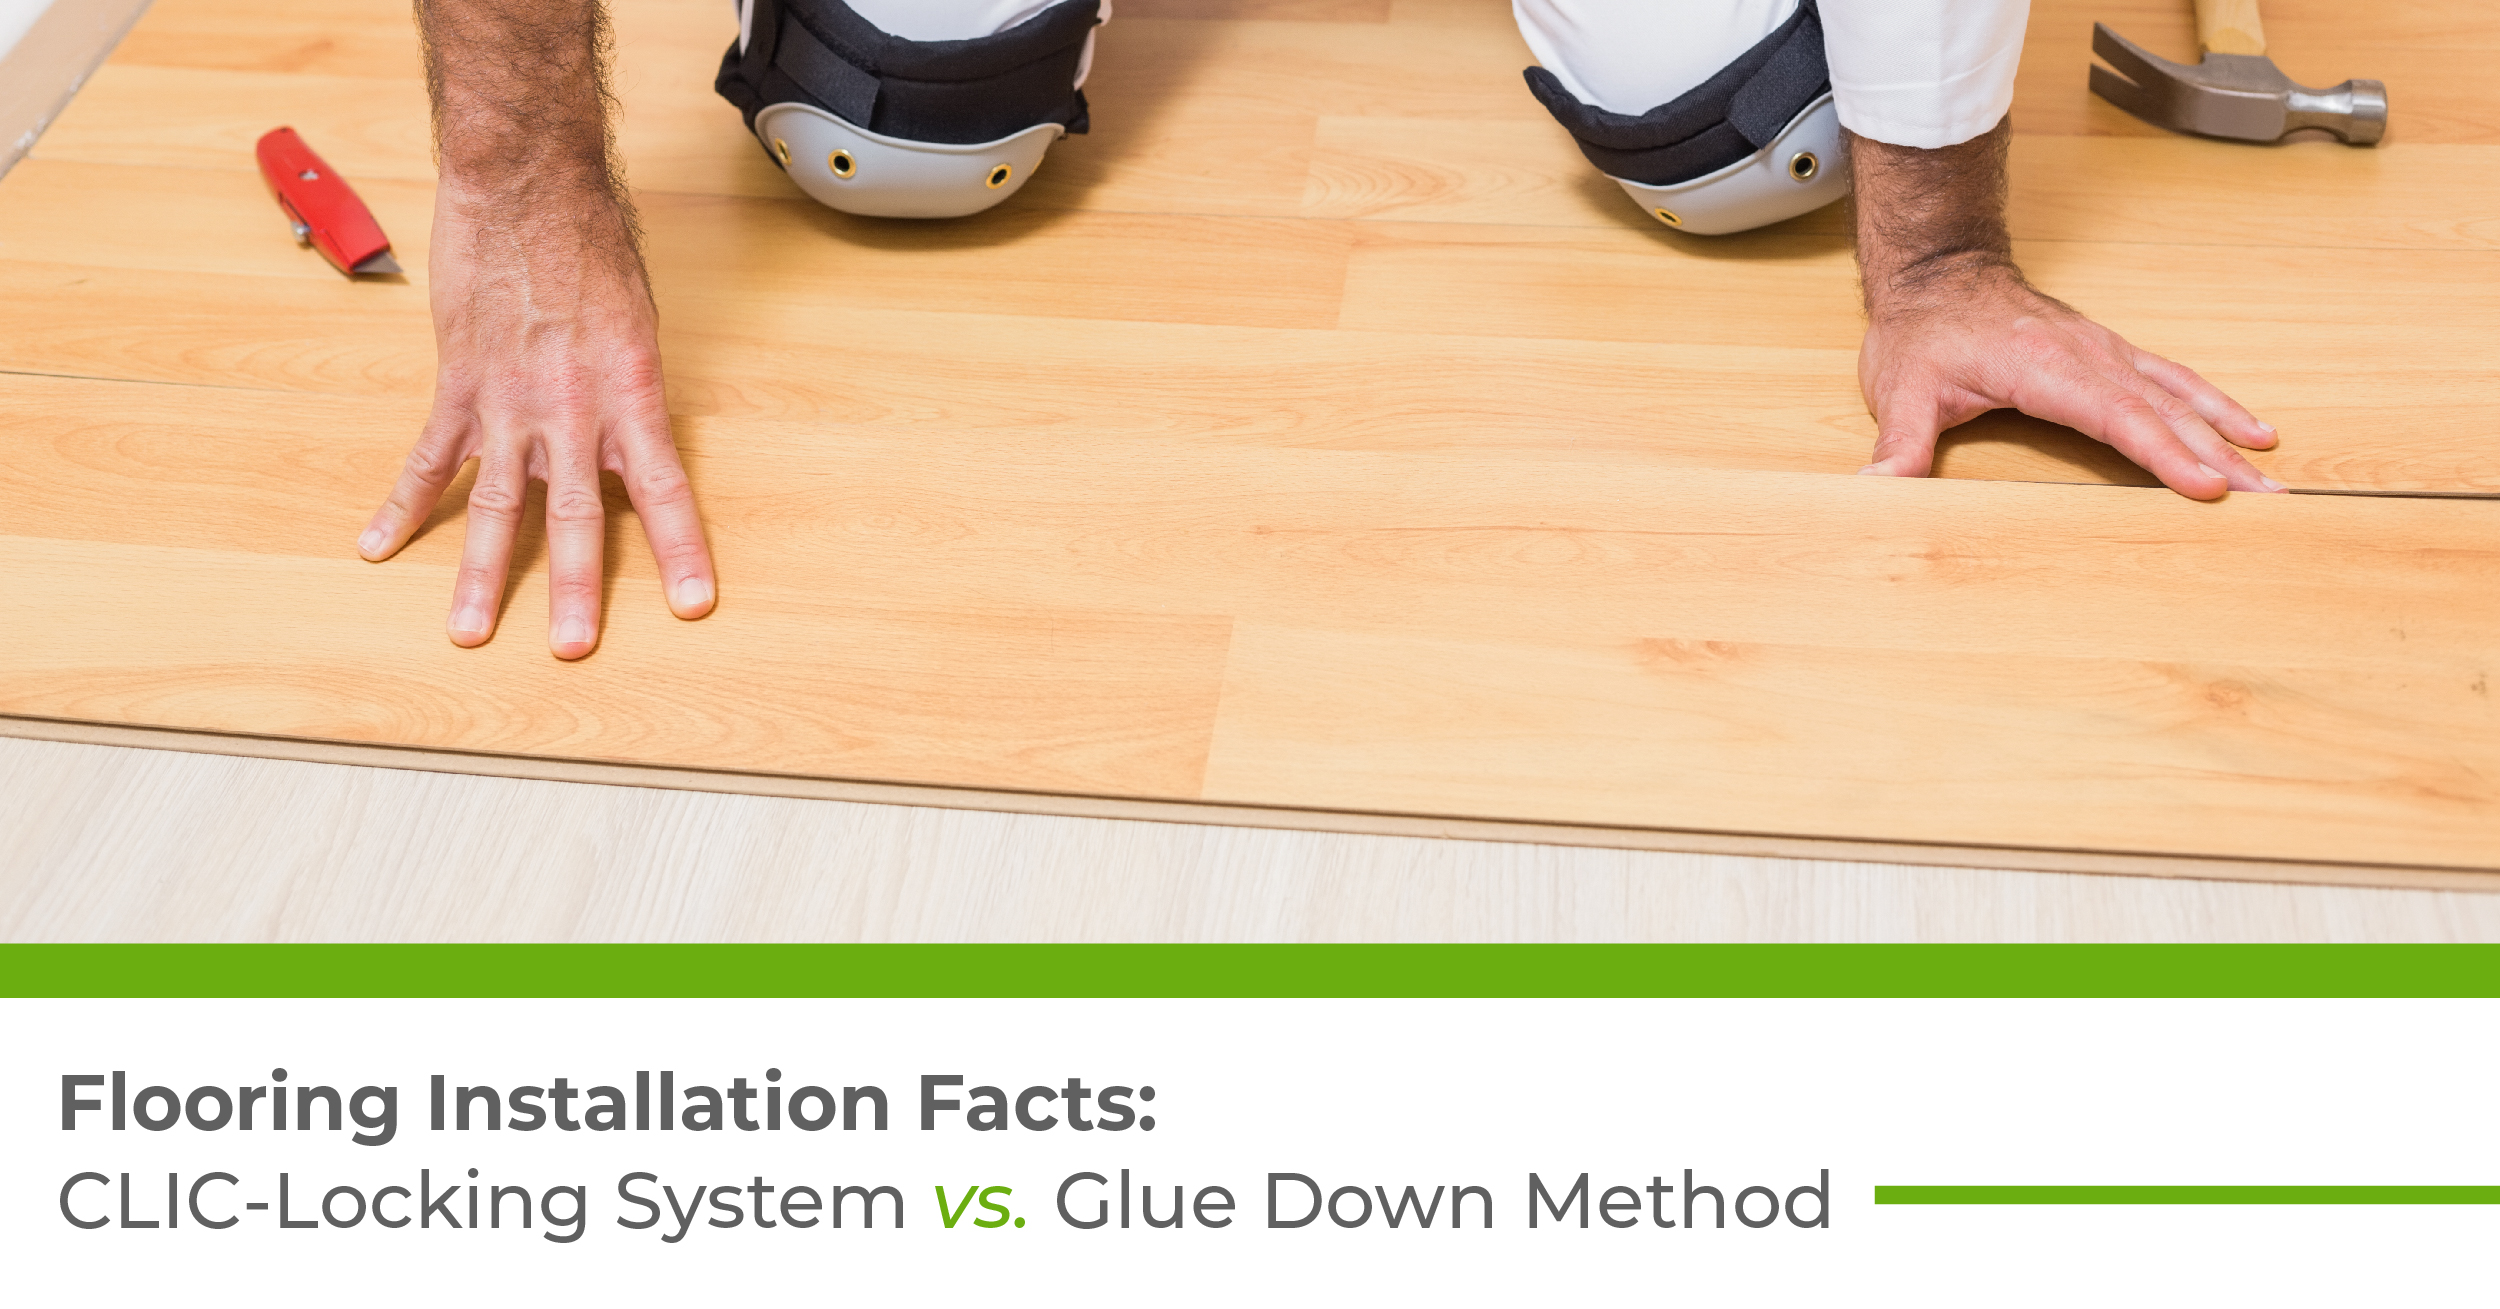 Flooring Installation Facts Clic Locking System Vs Glue Down